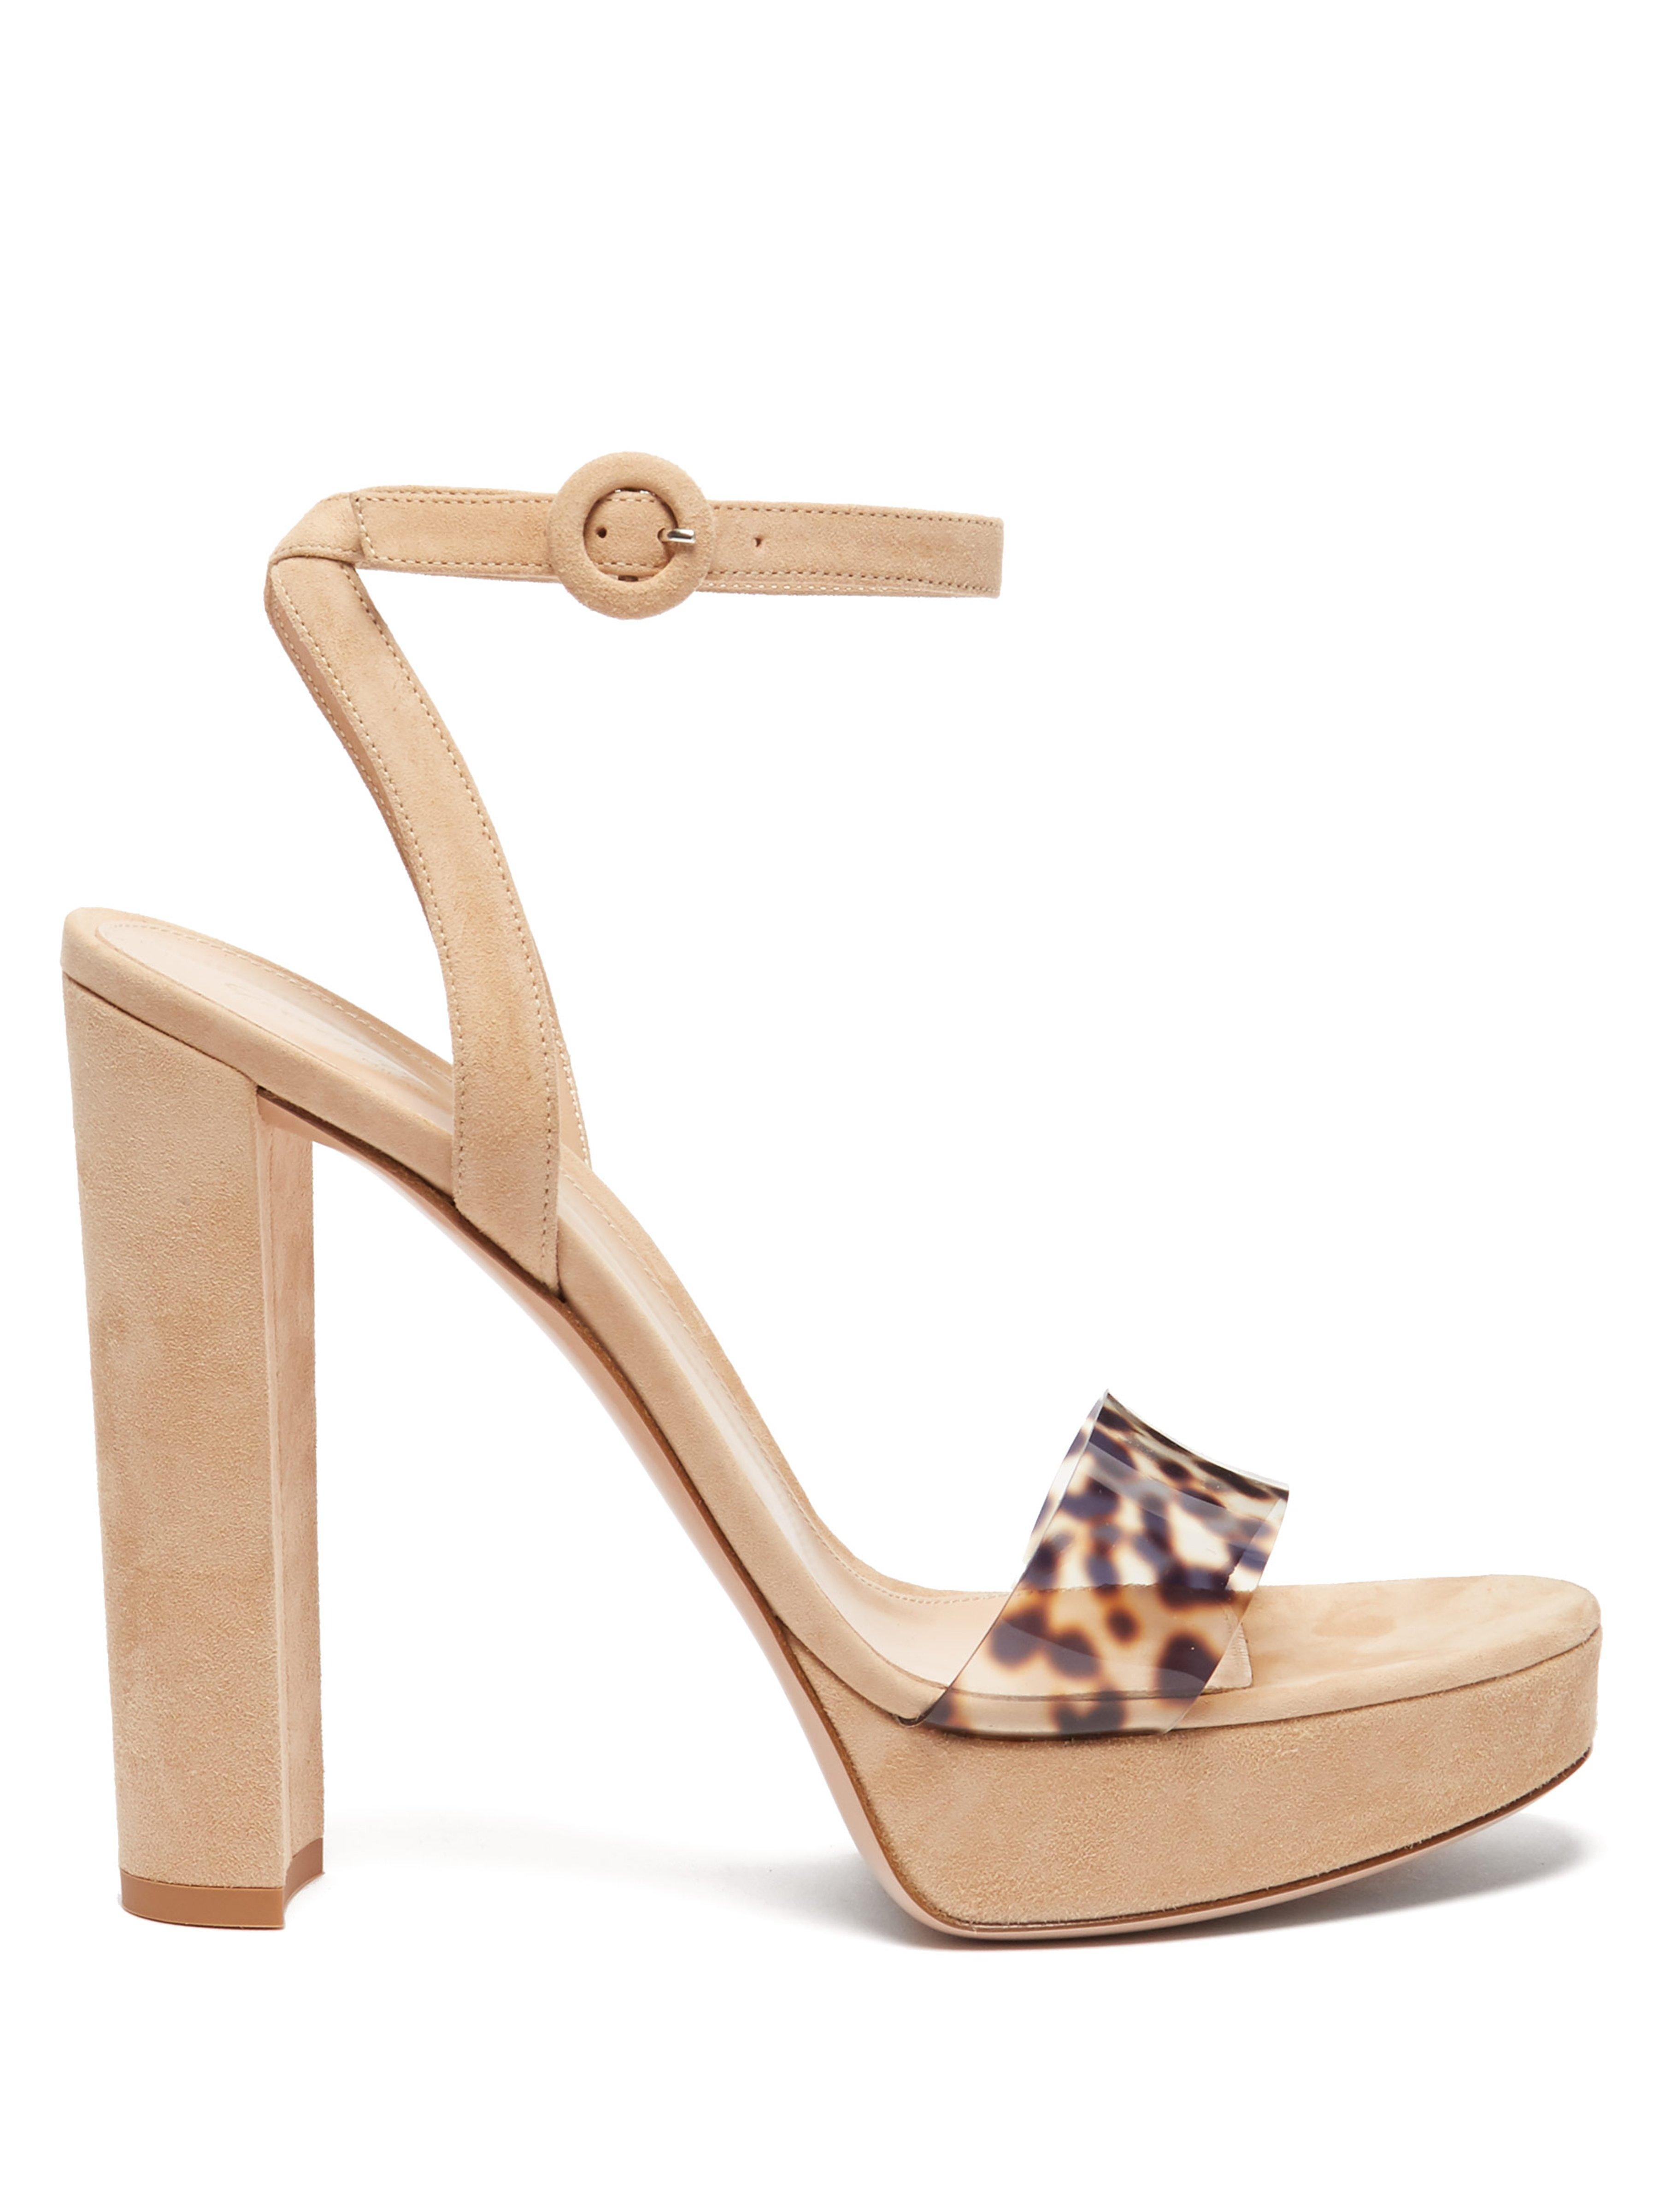 26a02750a88 Gianvito Rossi. Women s Natural Plexi 100 Leopard Strap Platform Sandals